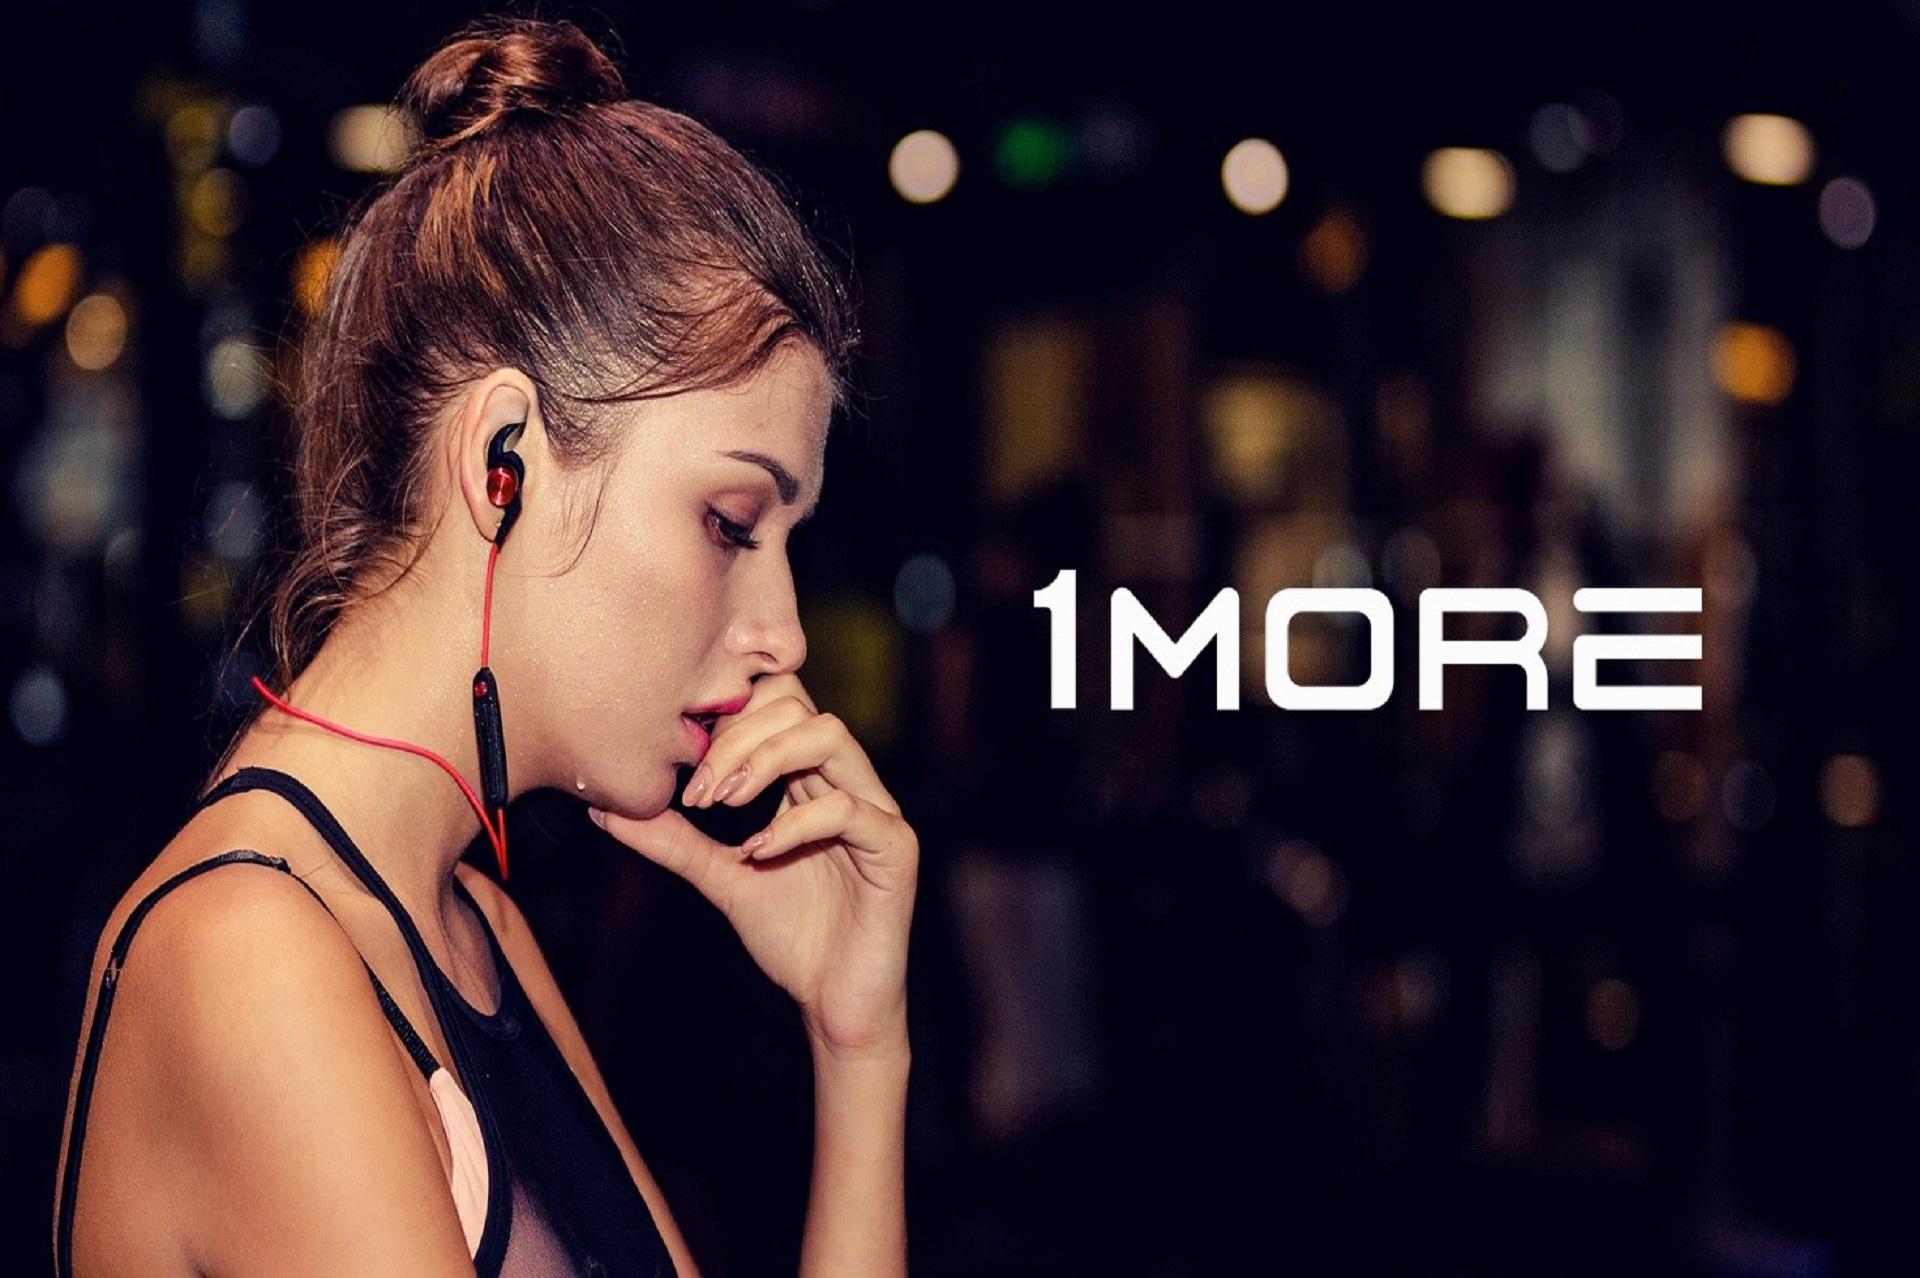 【1MORE】2018年発売の新商品の展示と今後発売予定の新モデルを参考出品致します。